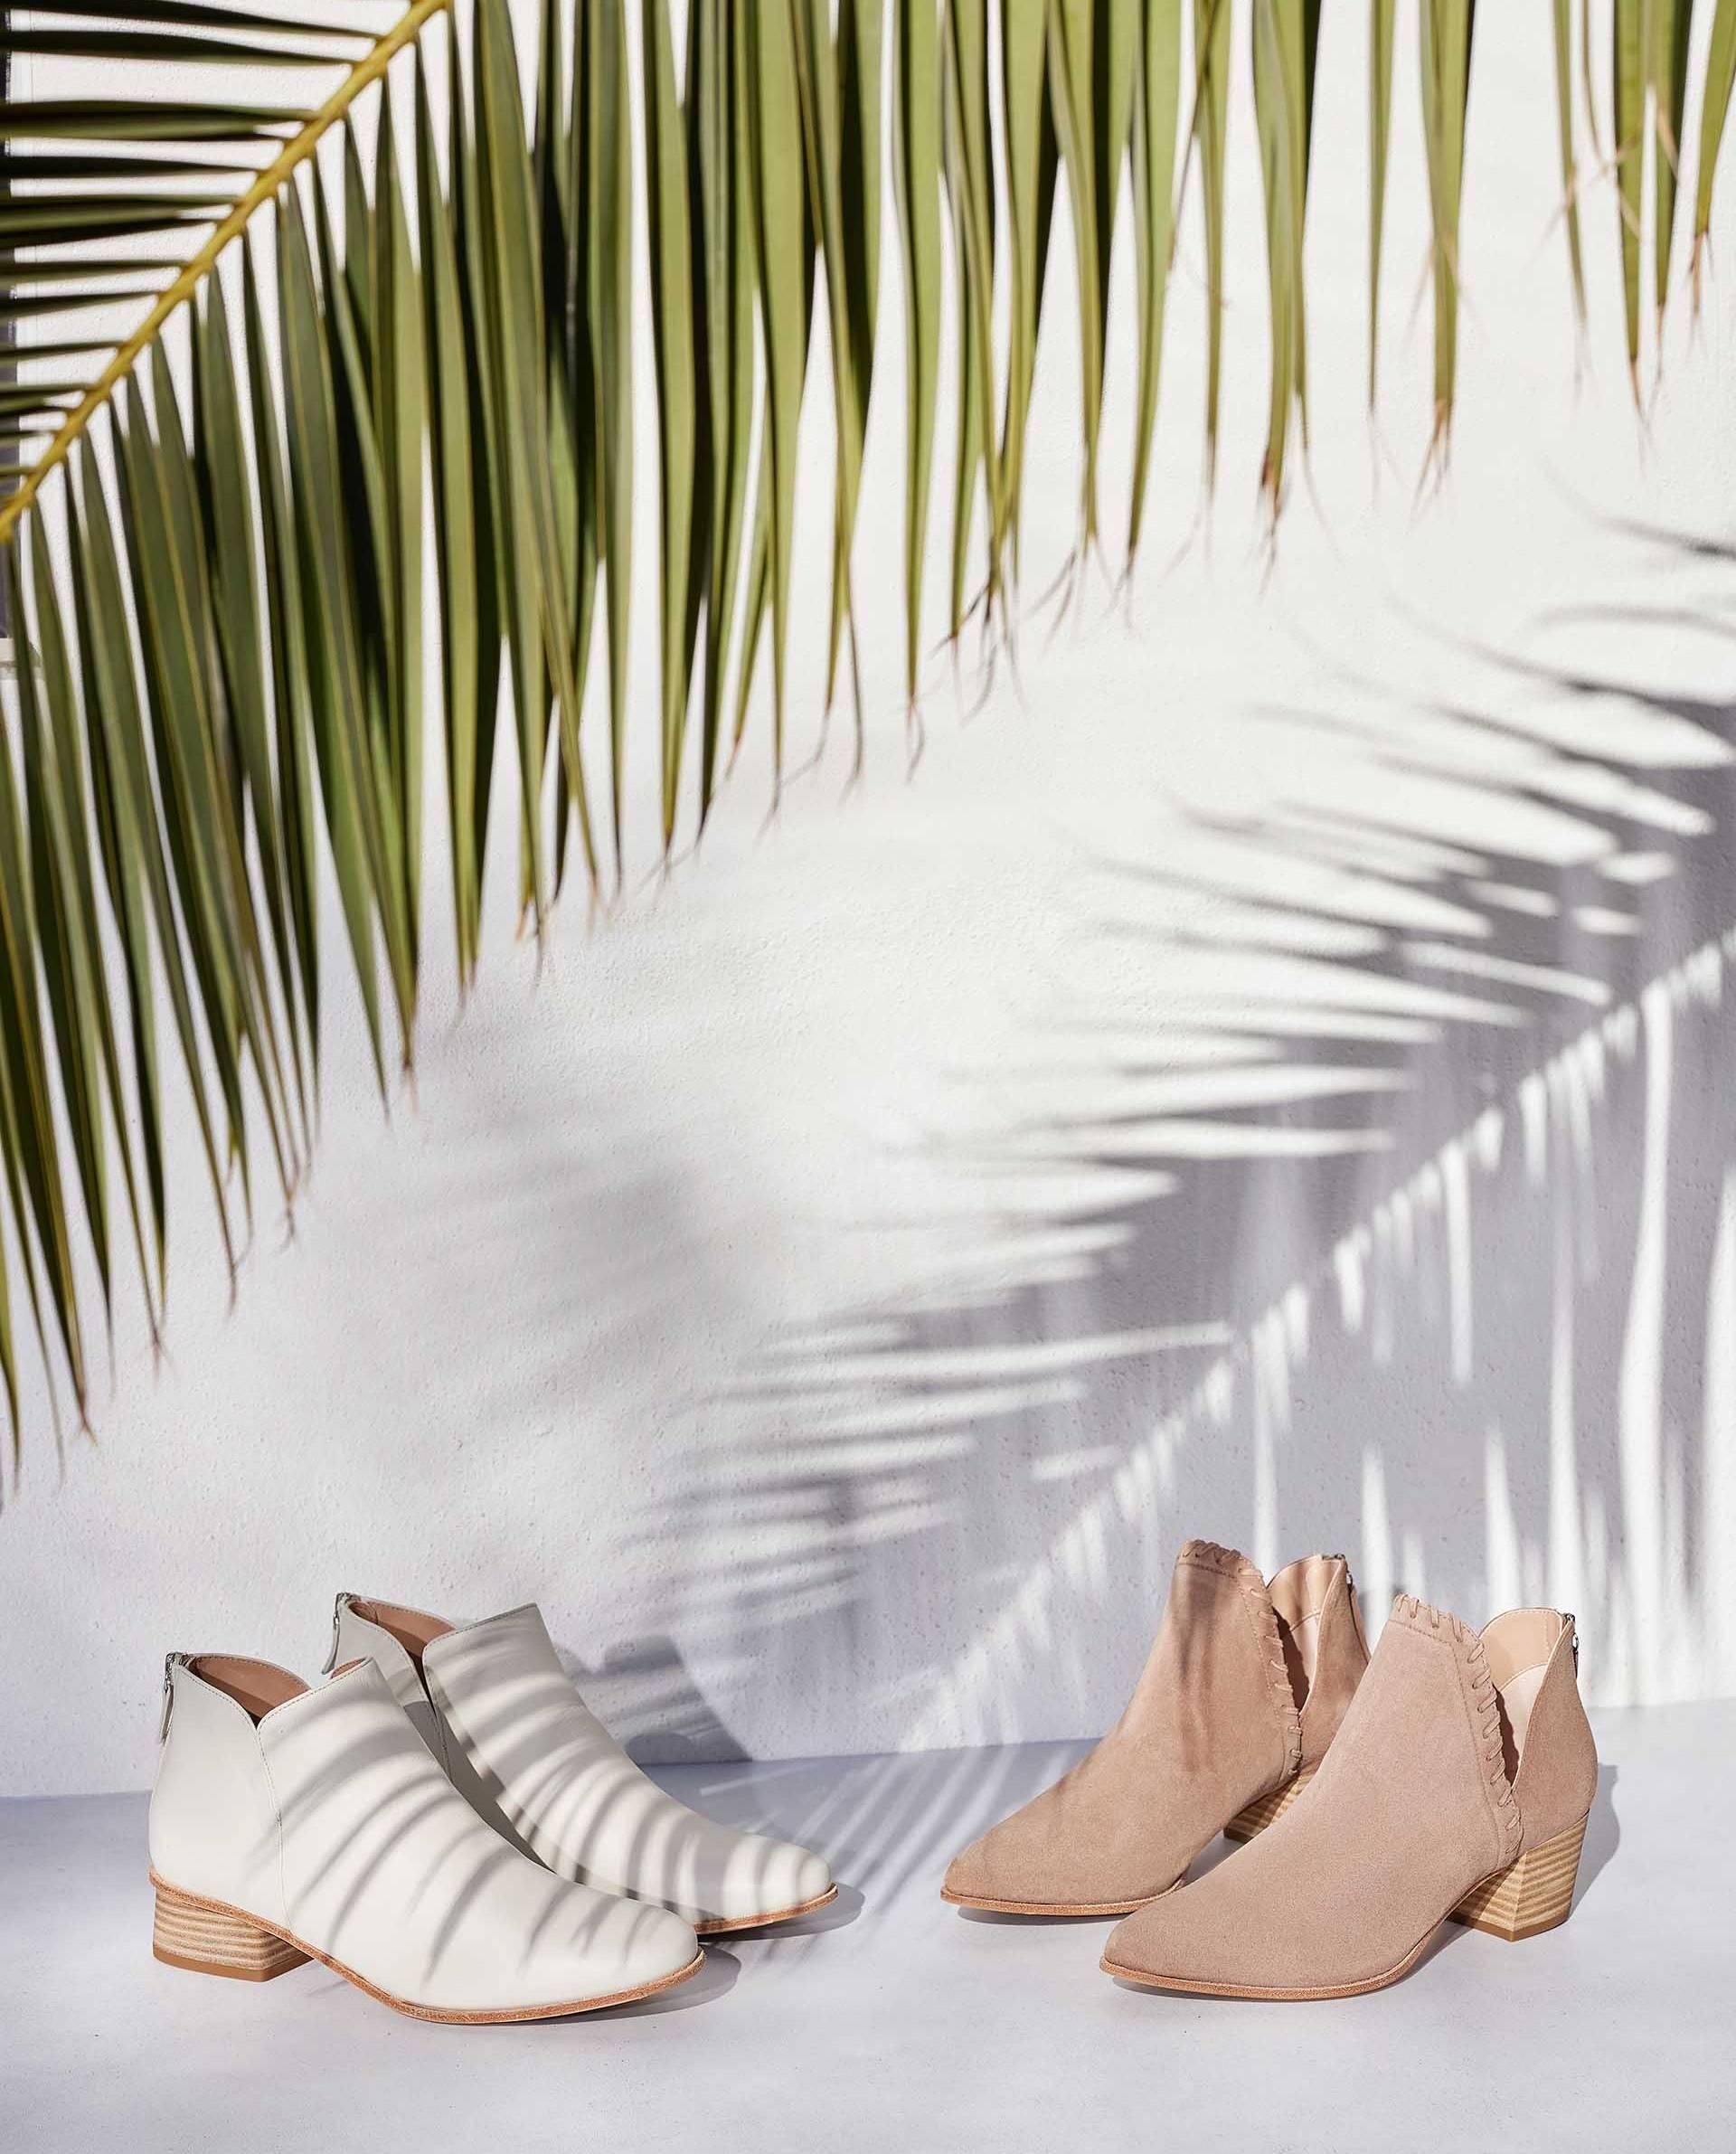 Unisa Ankle boots EJEME_VU ivory